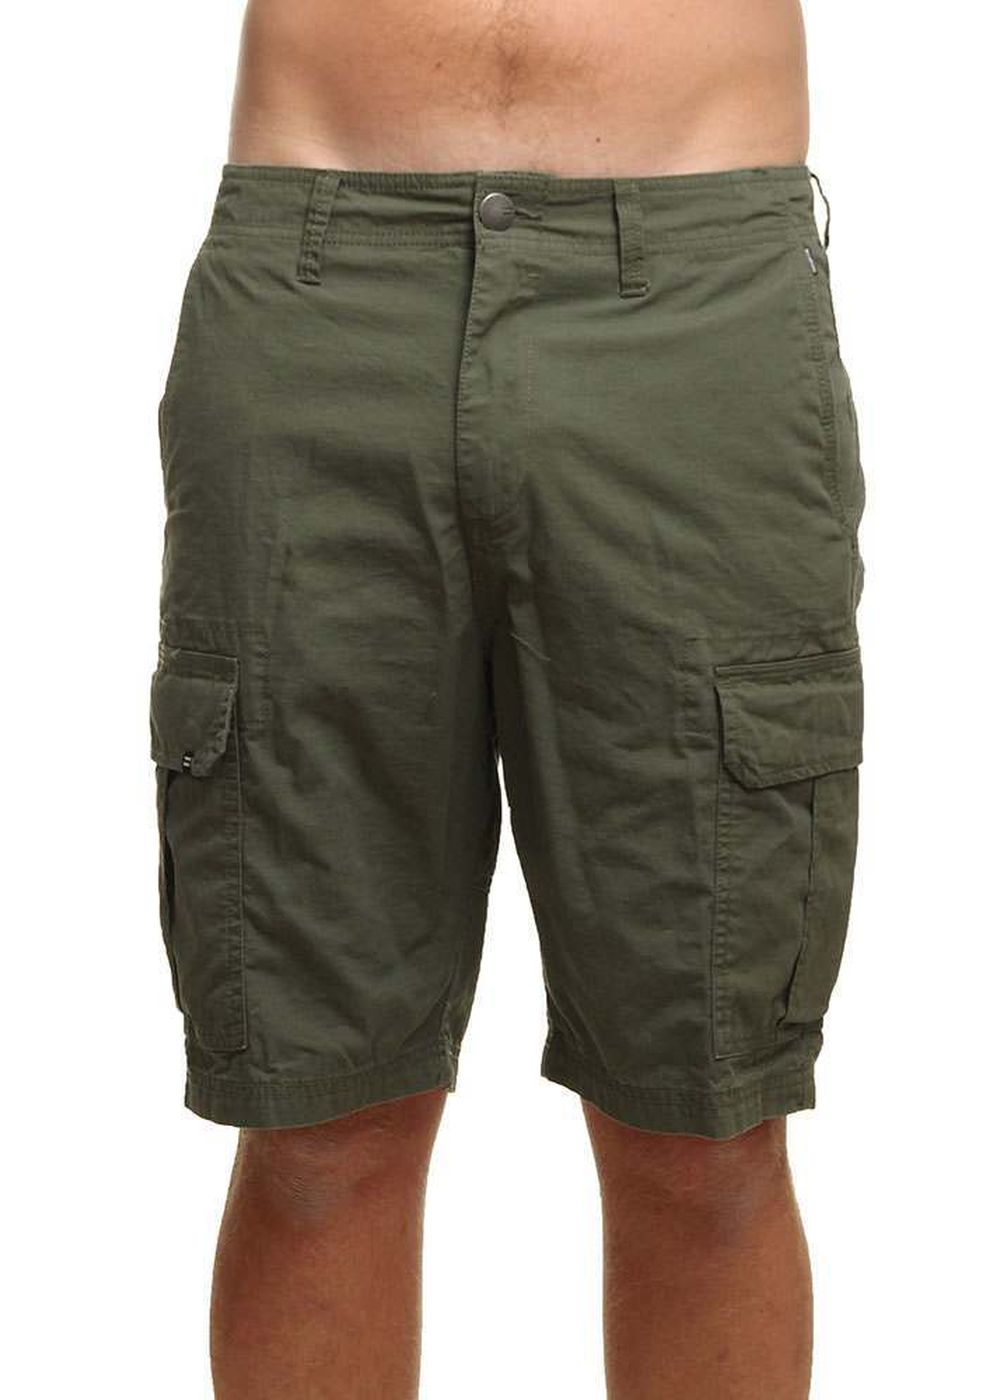 billabong-scheme-cargo-shorts-military